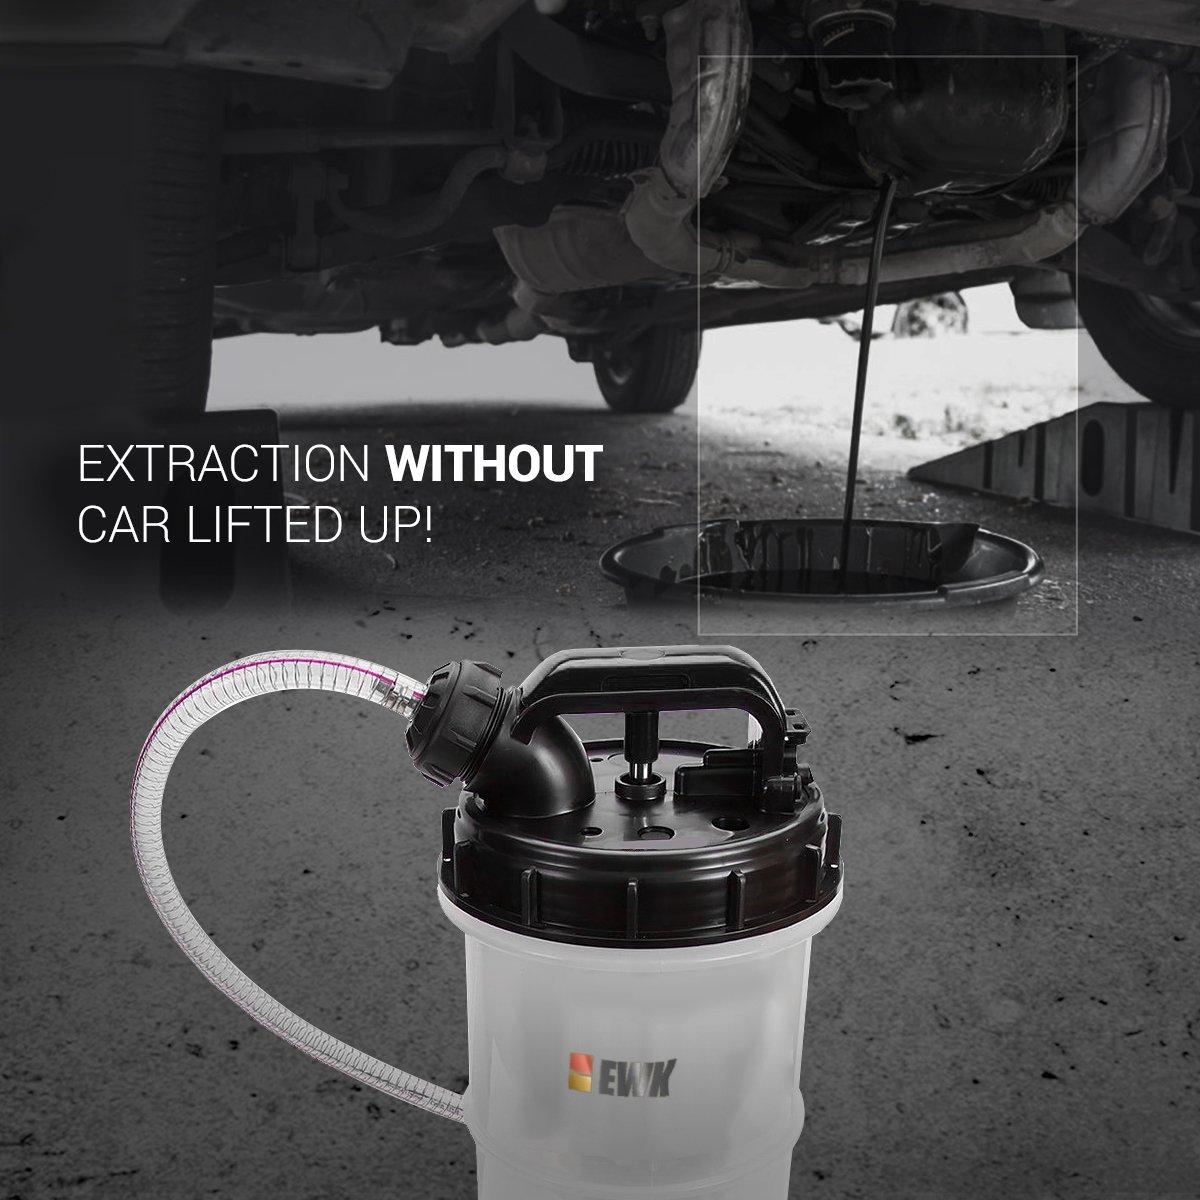 EWK 7.5 Liter Manual Oil Pump Extractor Fluid Evacuator For DIY Oil Change by EWK (Image #6)